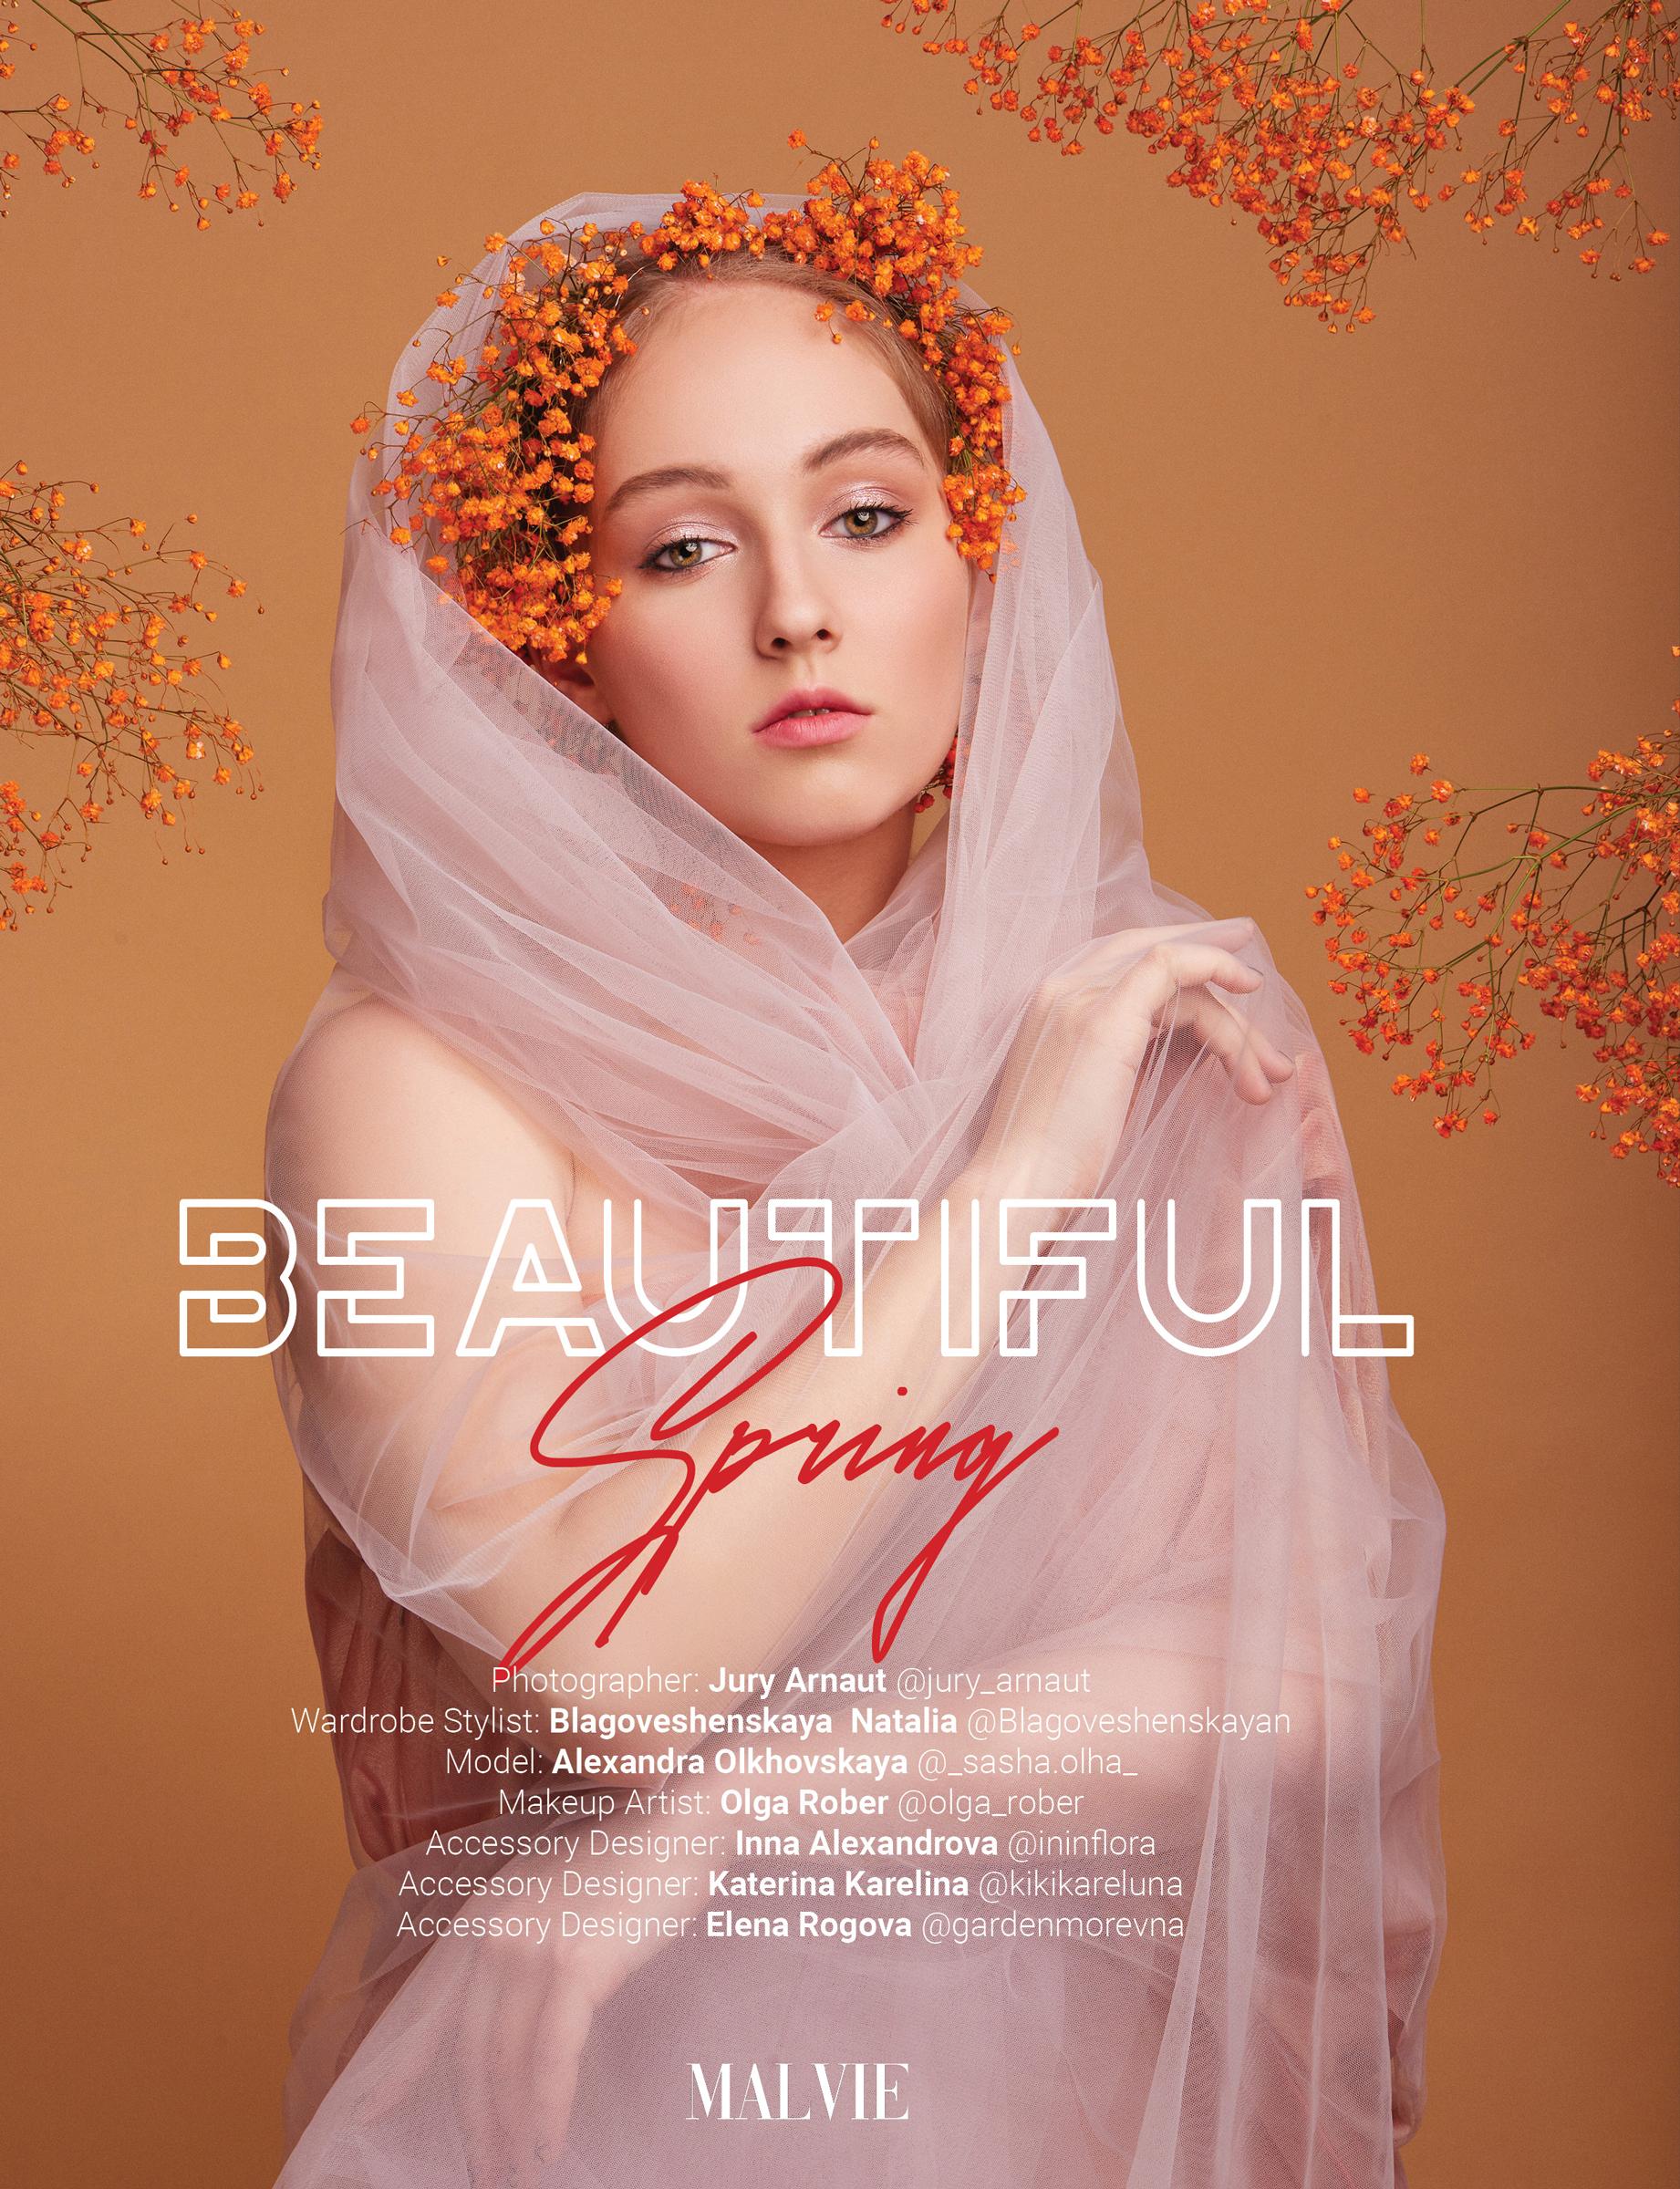 Фотограф Арнаут Юрий, модель, девушка, fashion